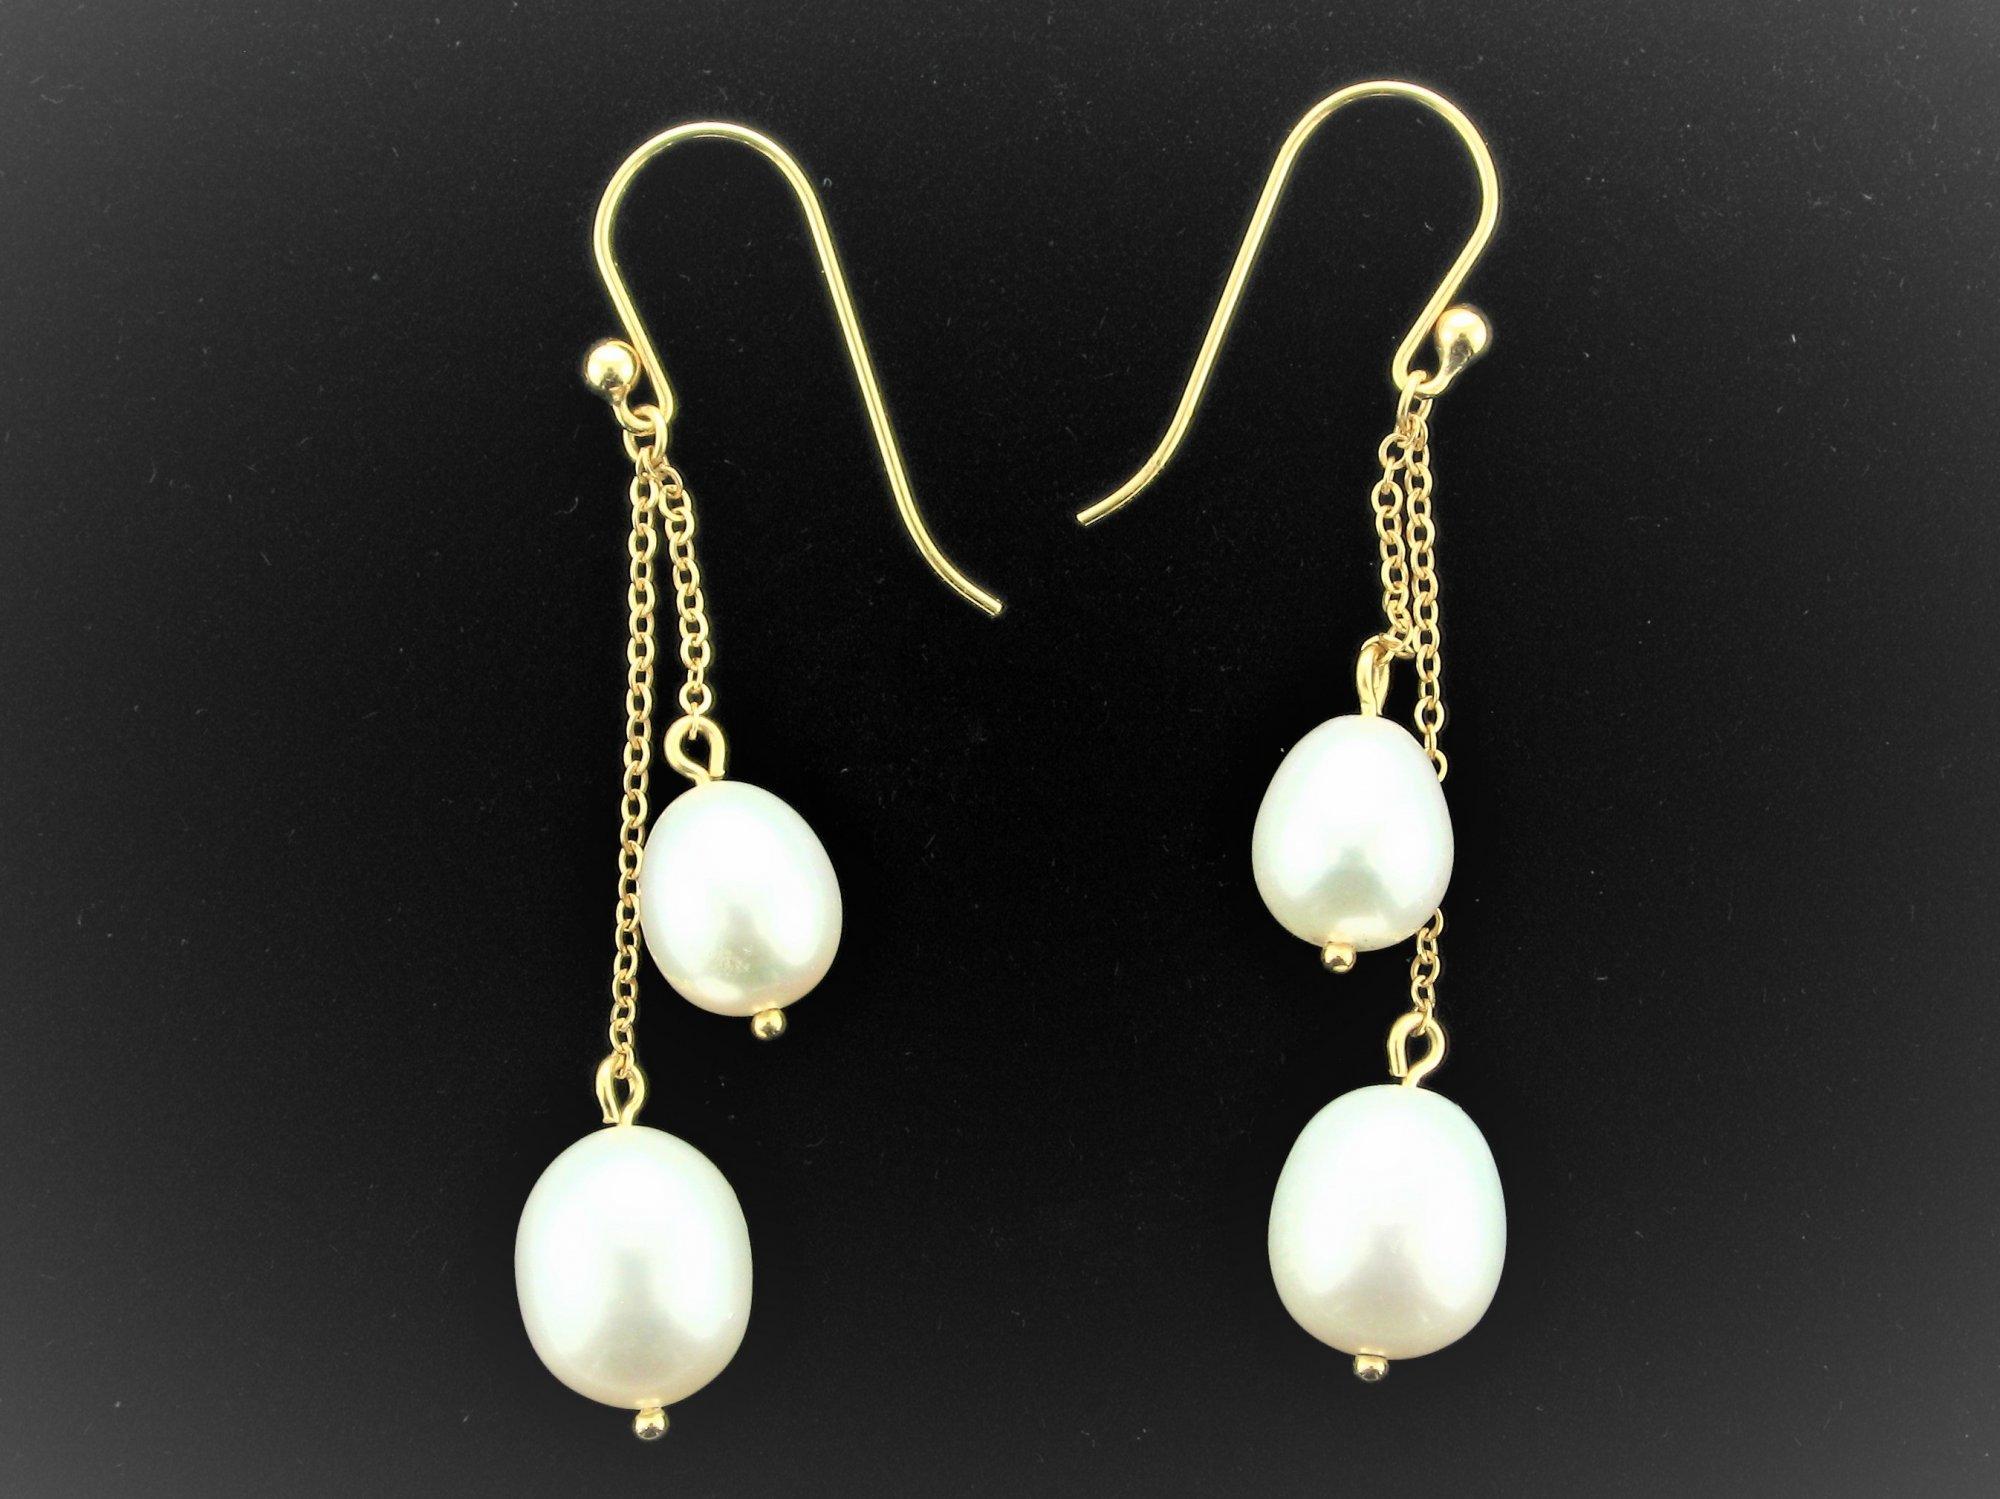 Twin Dangle Pearl Earrings set in 14 Karat Yellow Gold